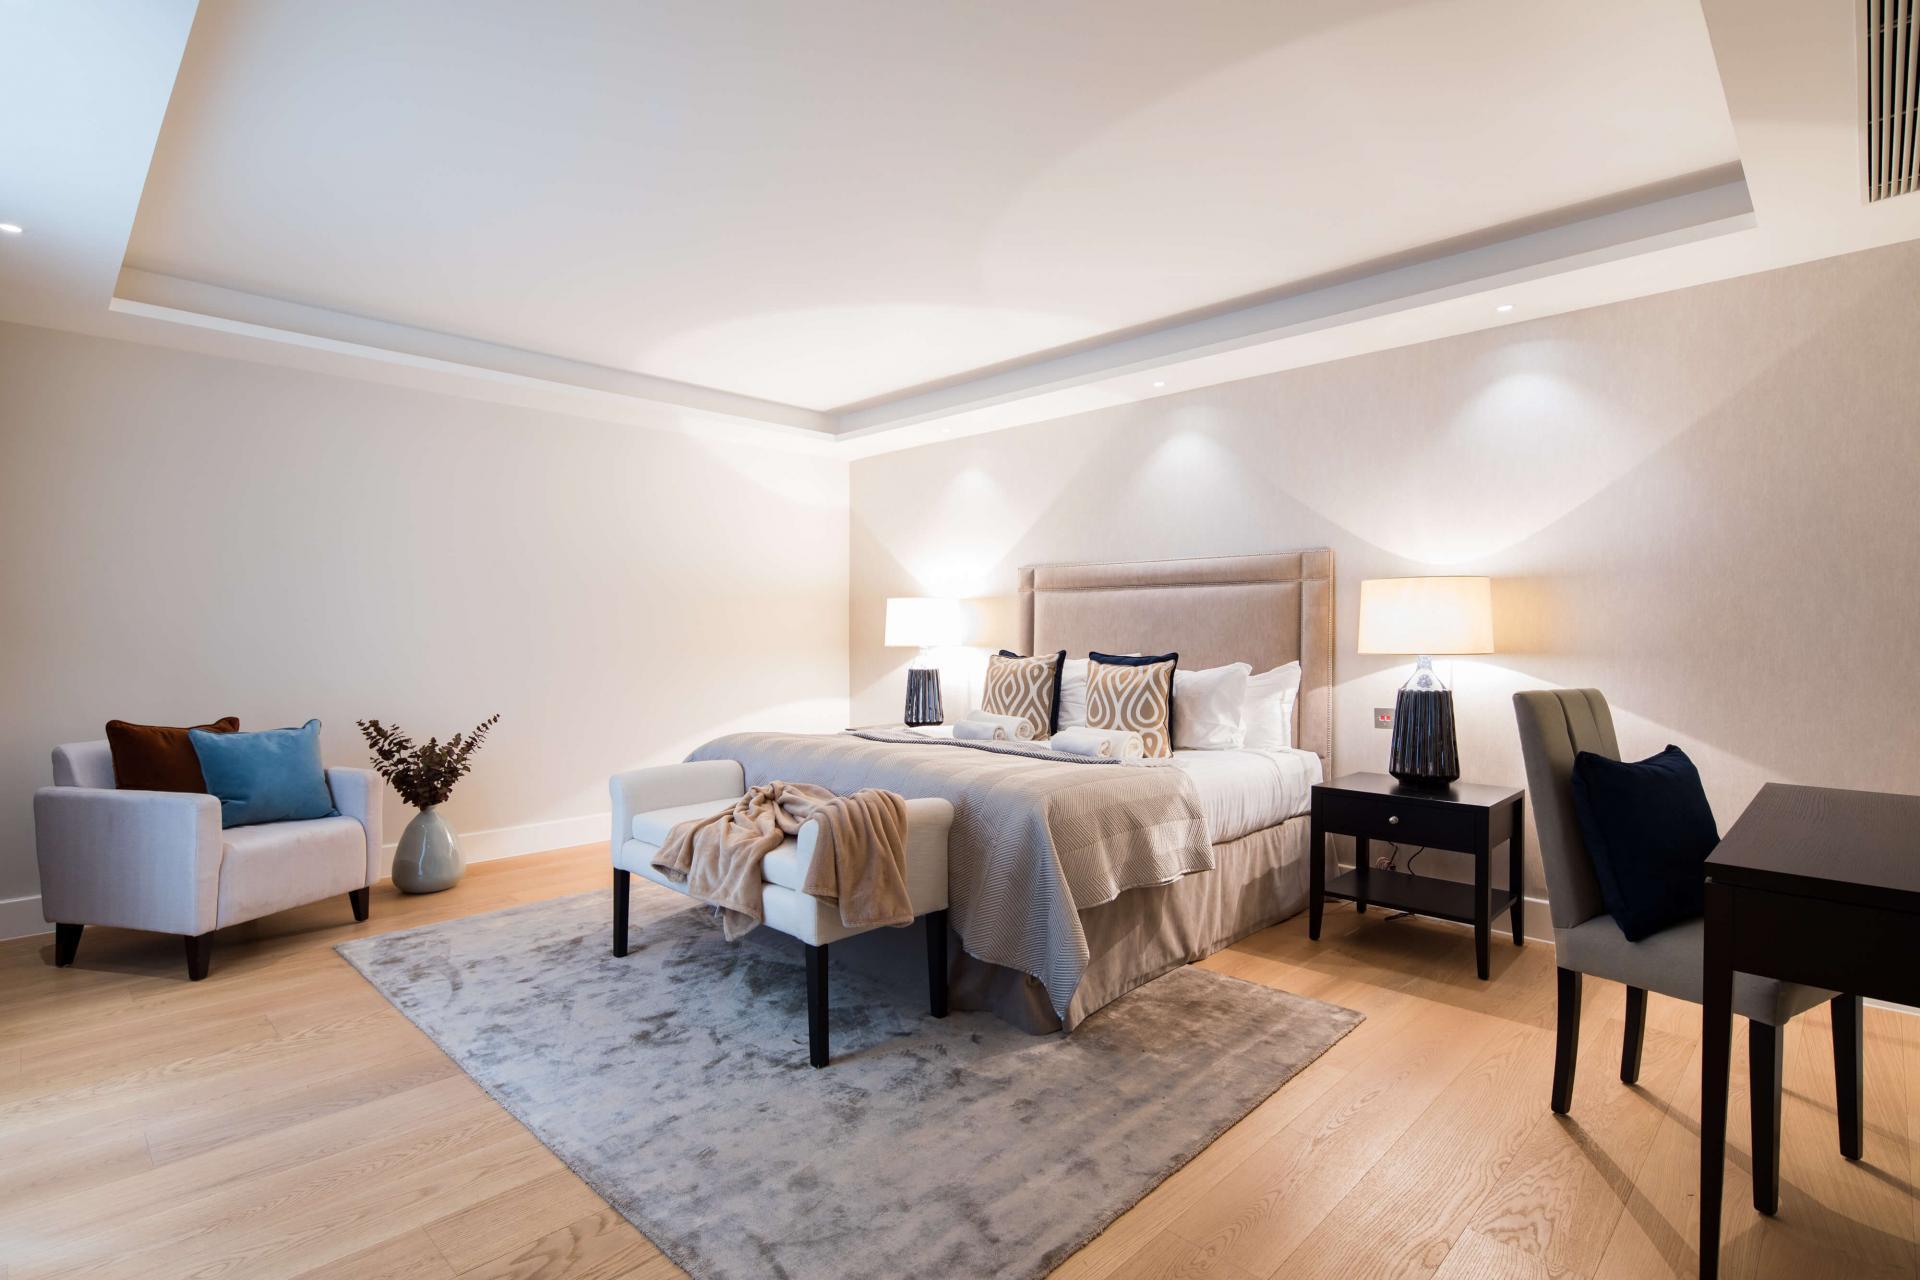 Cosy room at Logan Place Apartments, Kensington, London - Citybase Apartments